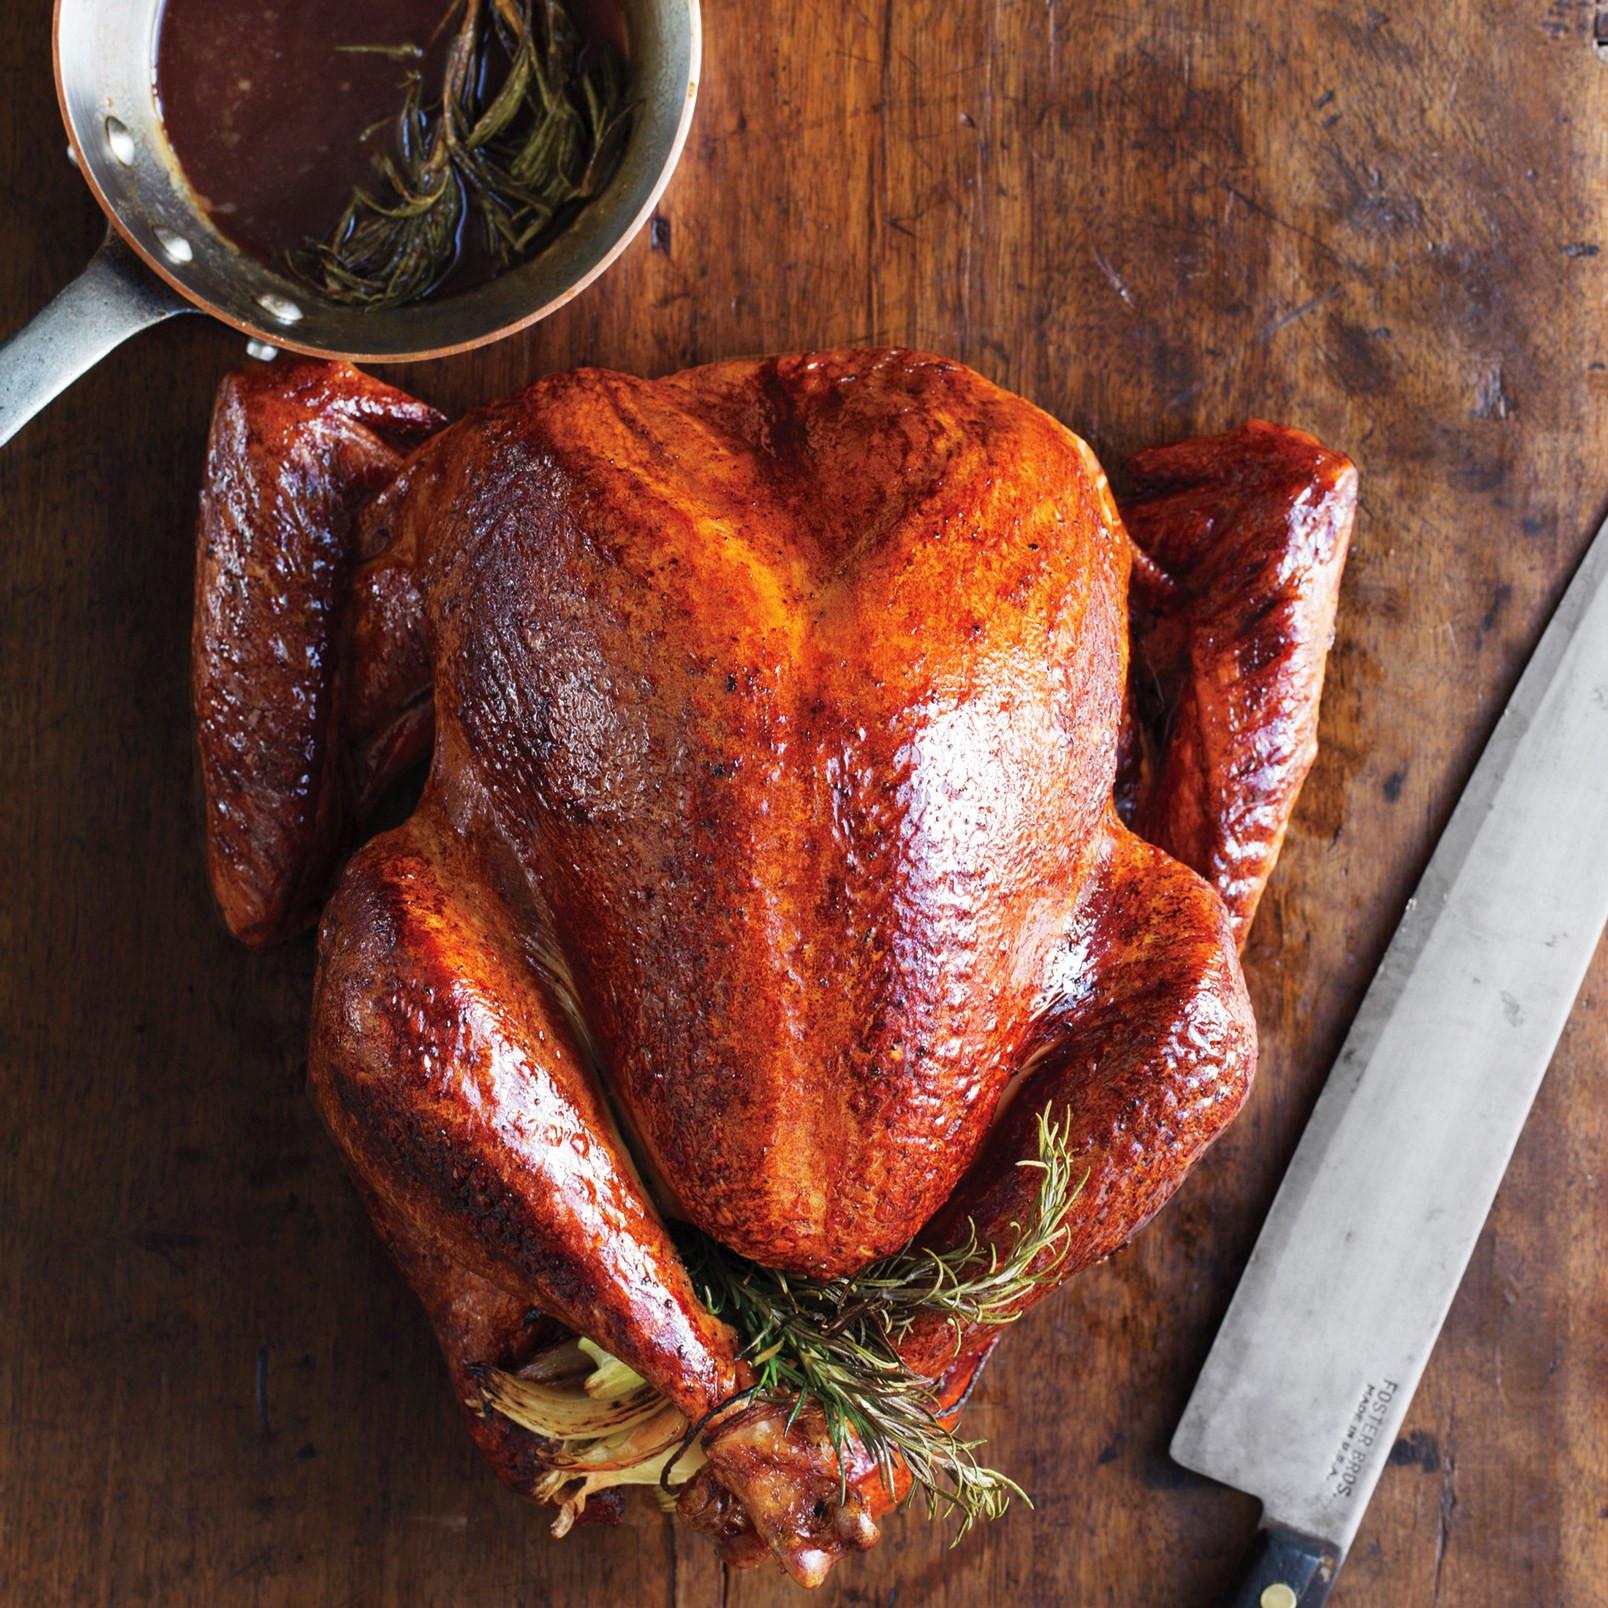 Roast Turkey Recipes Thanksgiving  A Simple Roast Turkey recipe